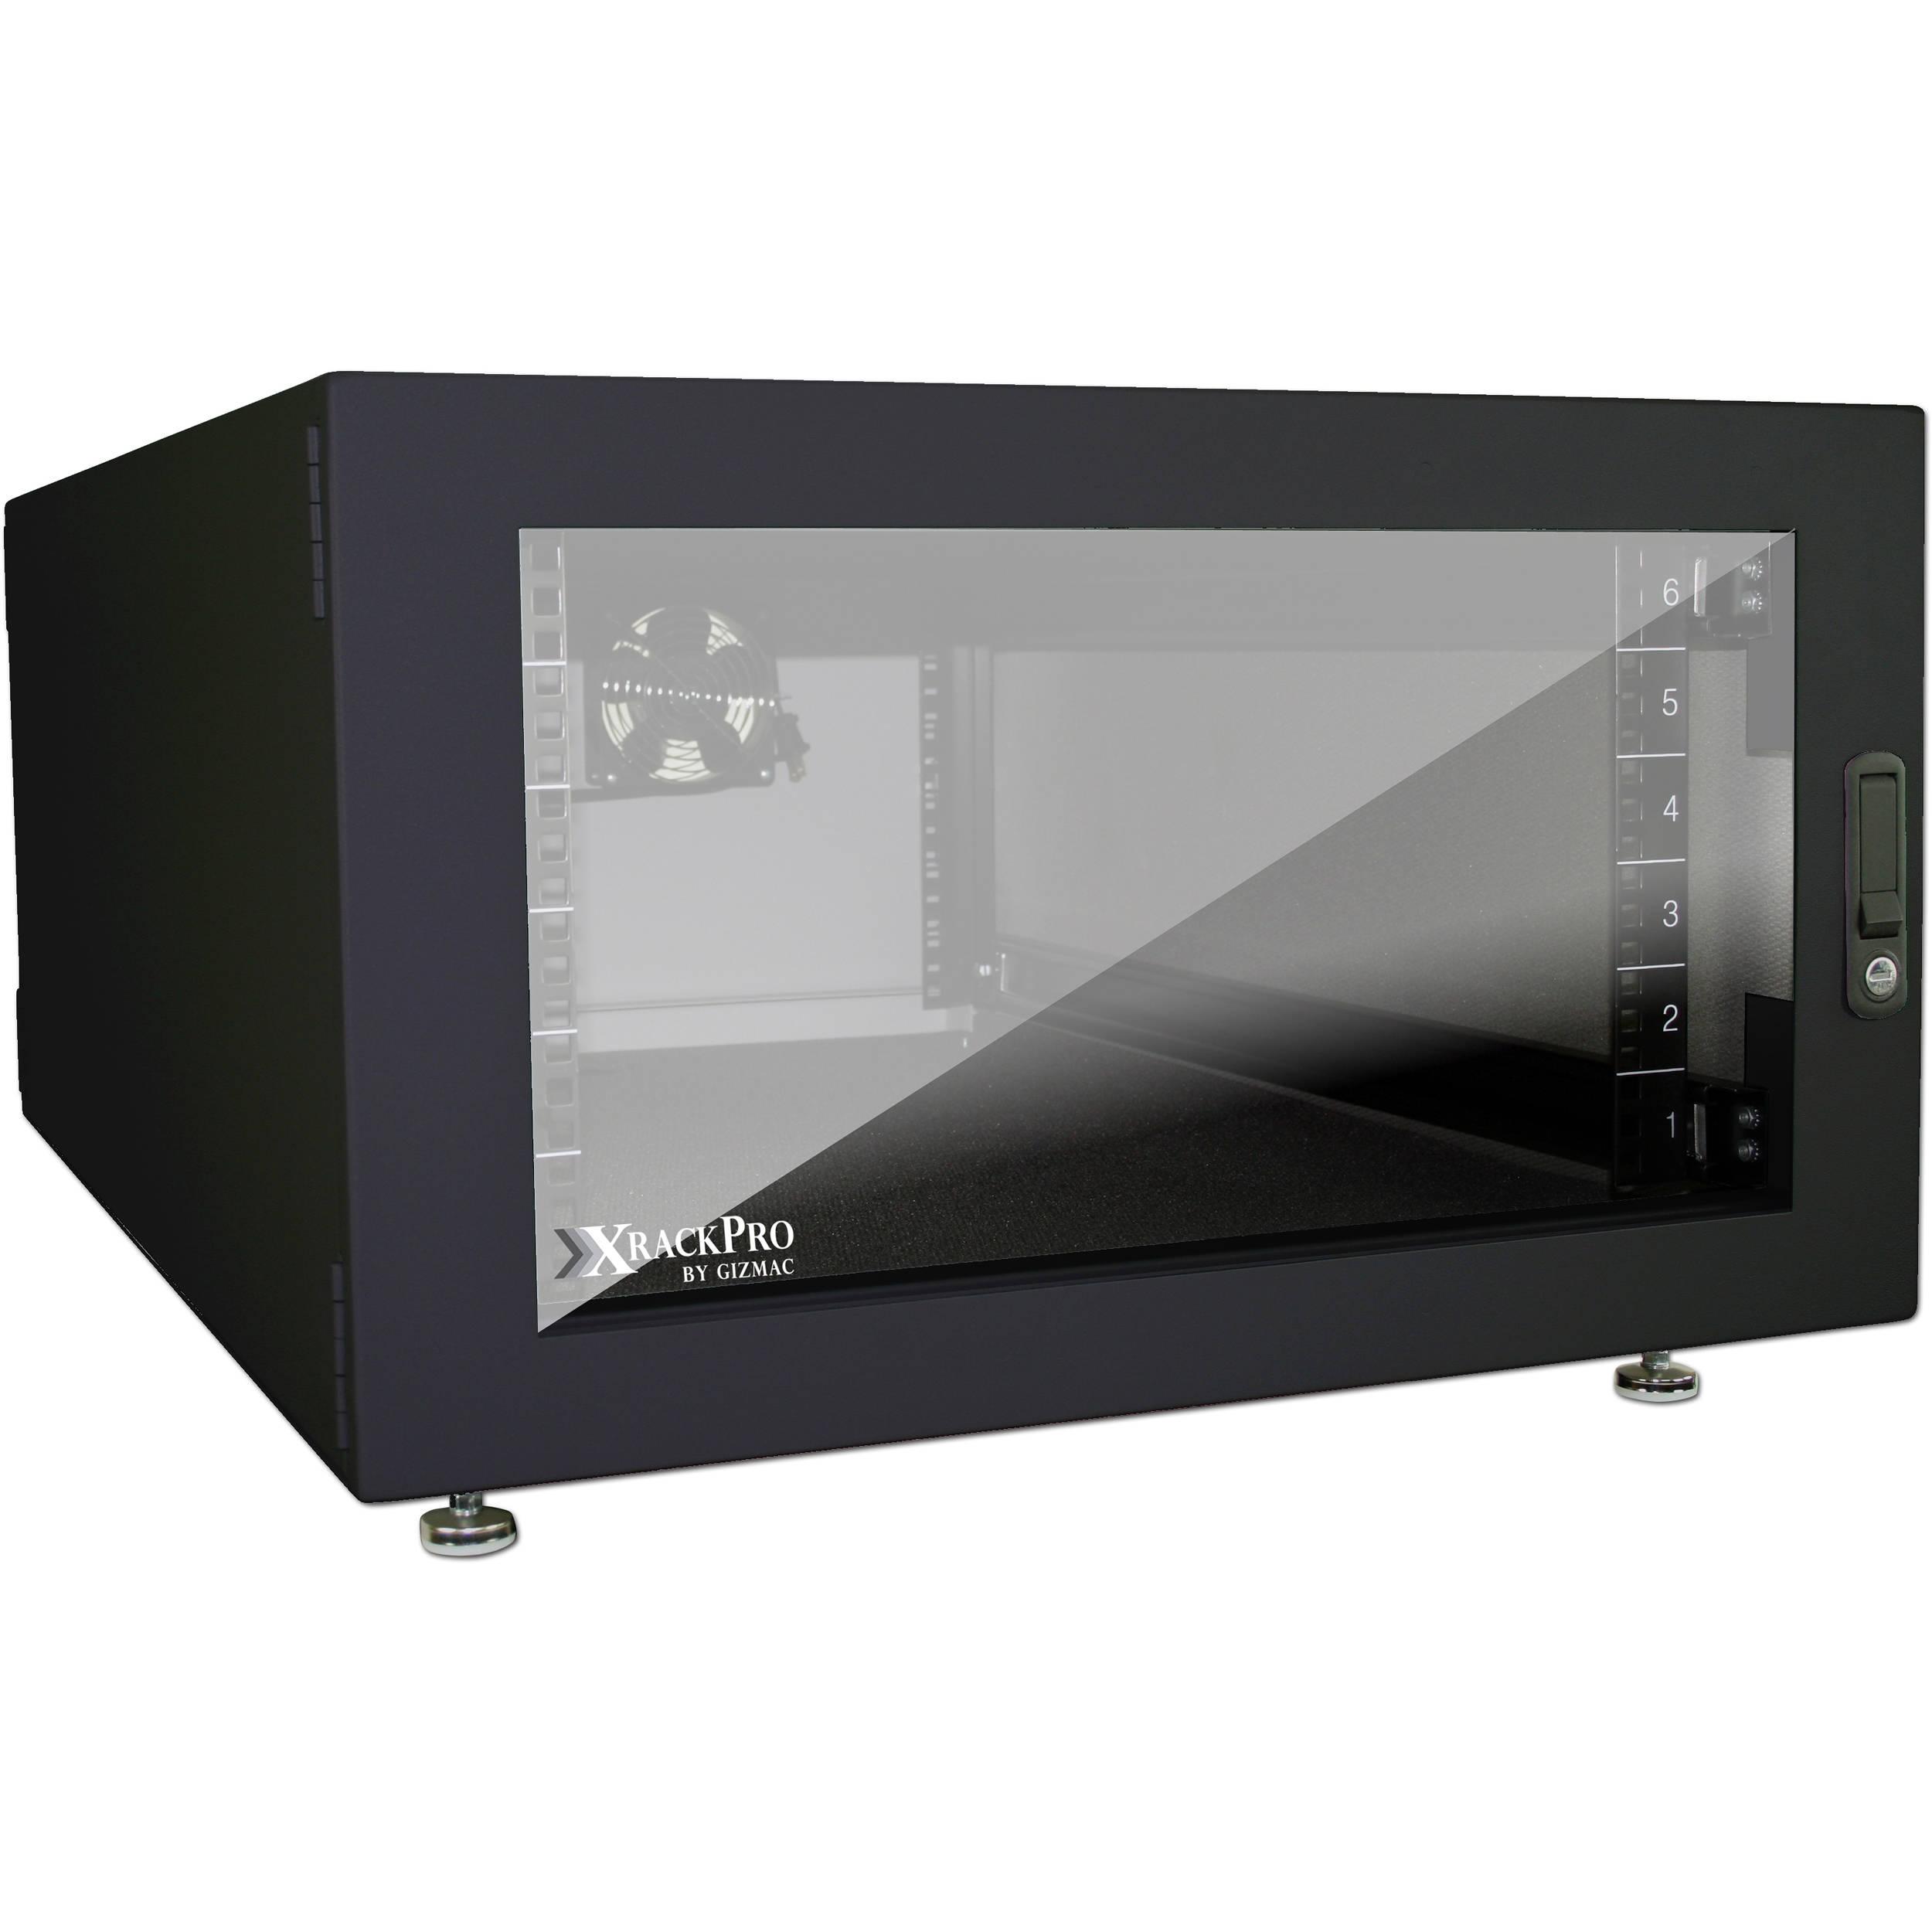 Xrackpro xrackpro2 noise reduction server rack xr nre2 6u for Rack mural 6u